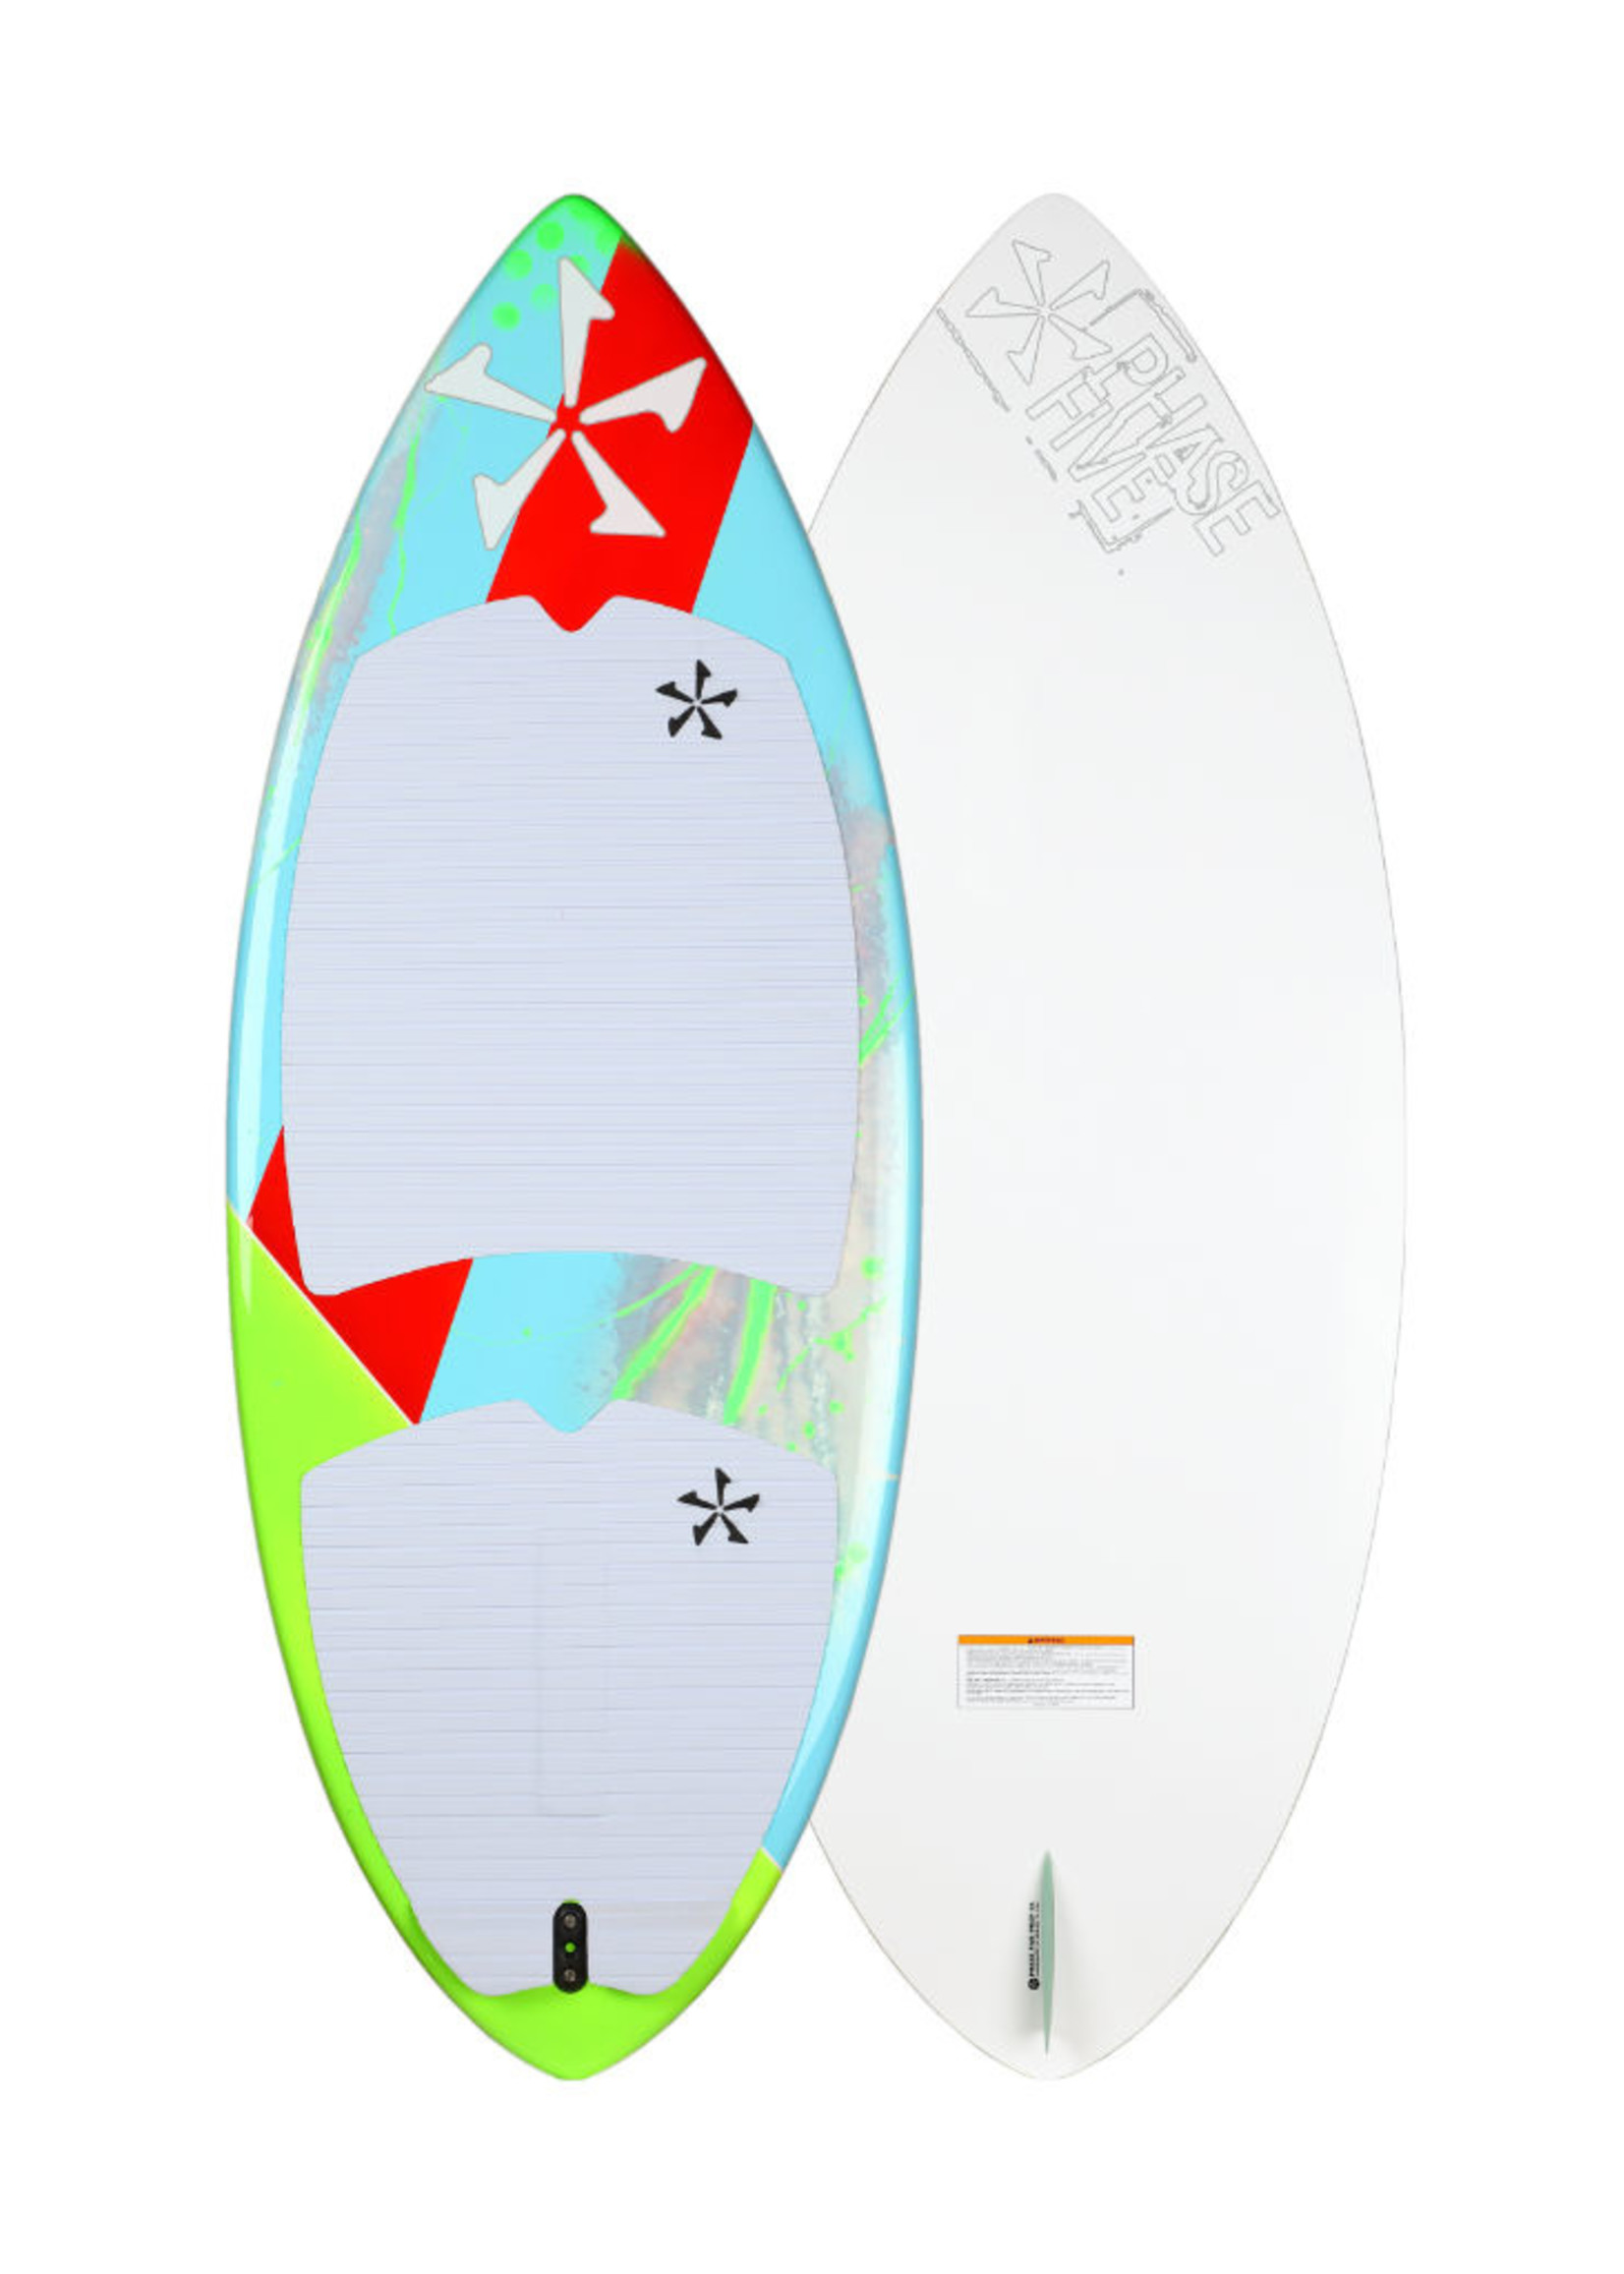 "Phase Five Phase Five Prop 54"" Skim-Style Wakesurf"